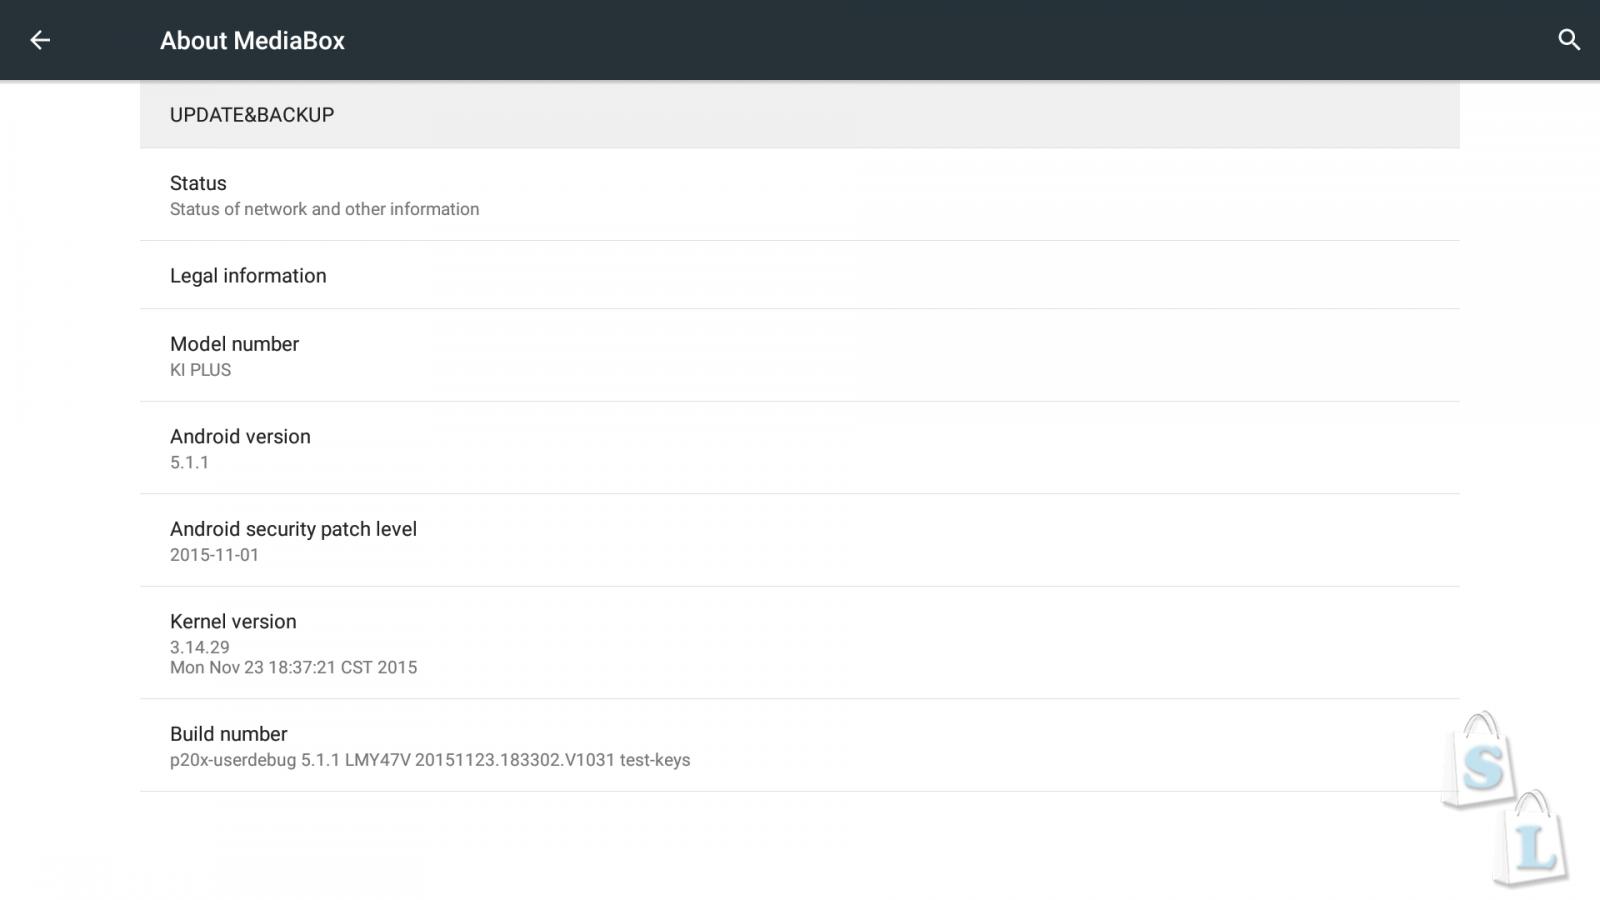 GearBest: ТВбокс на новом S905, интересно, как он в деле